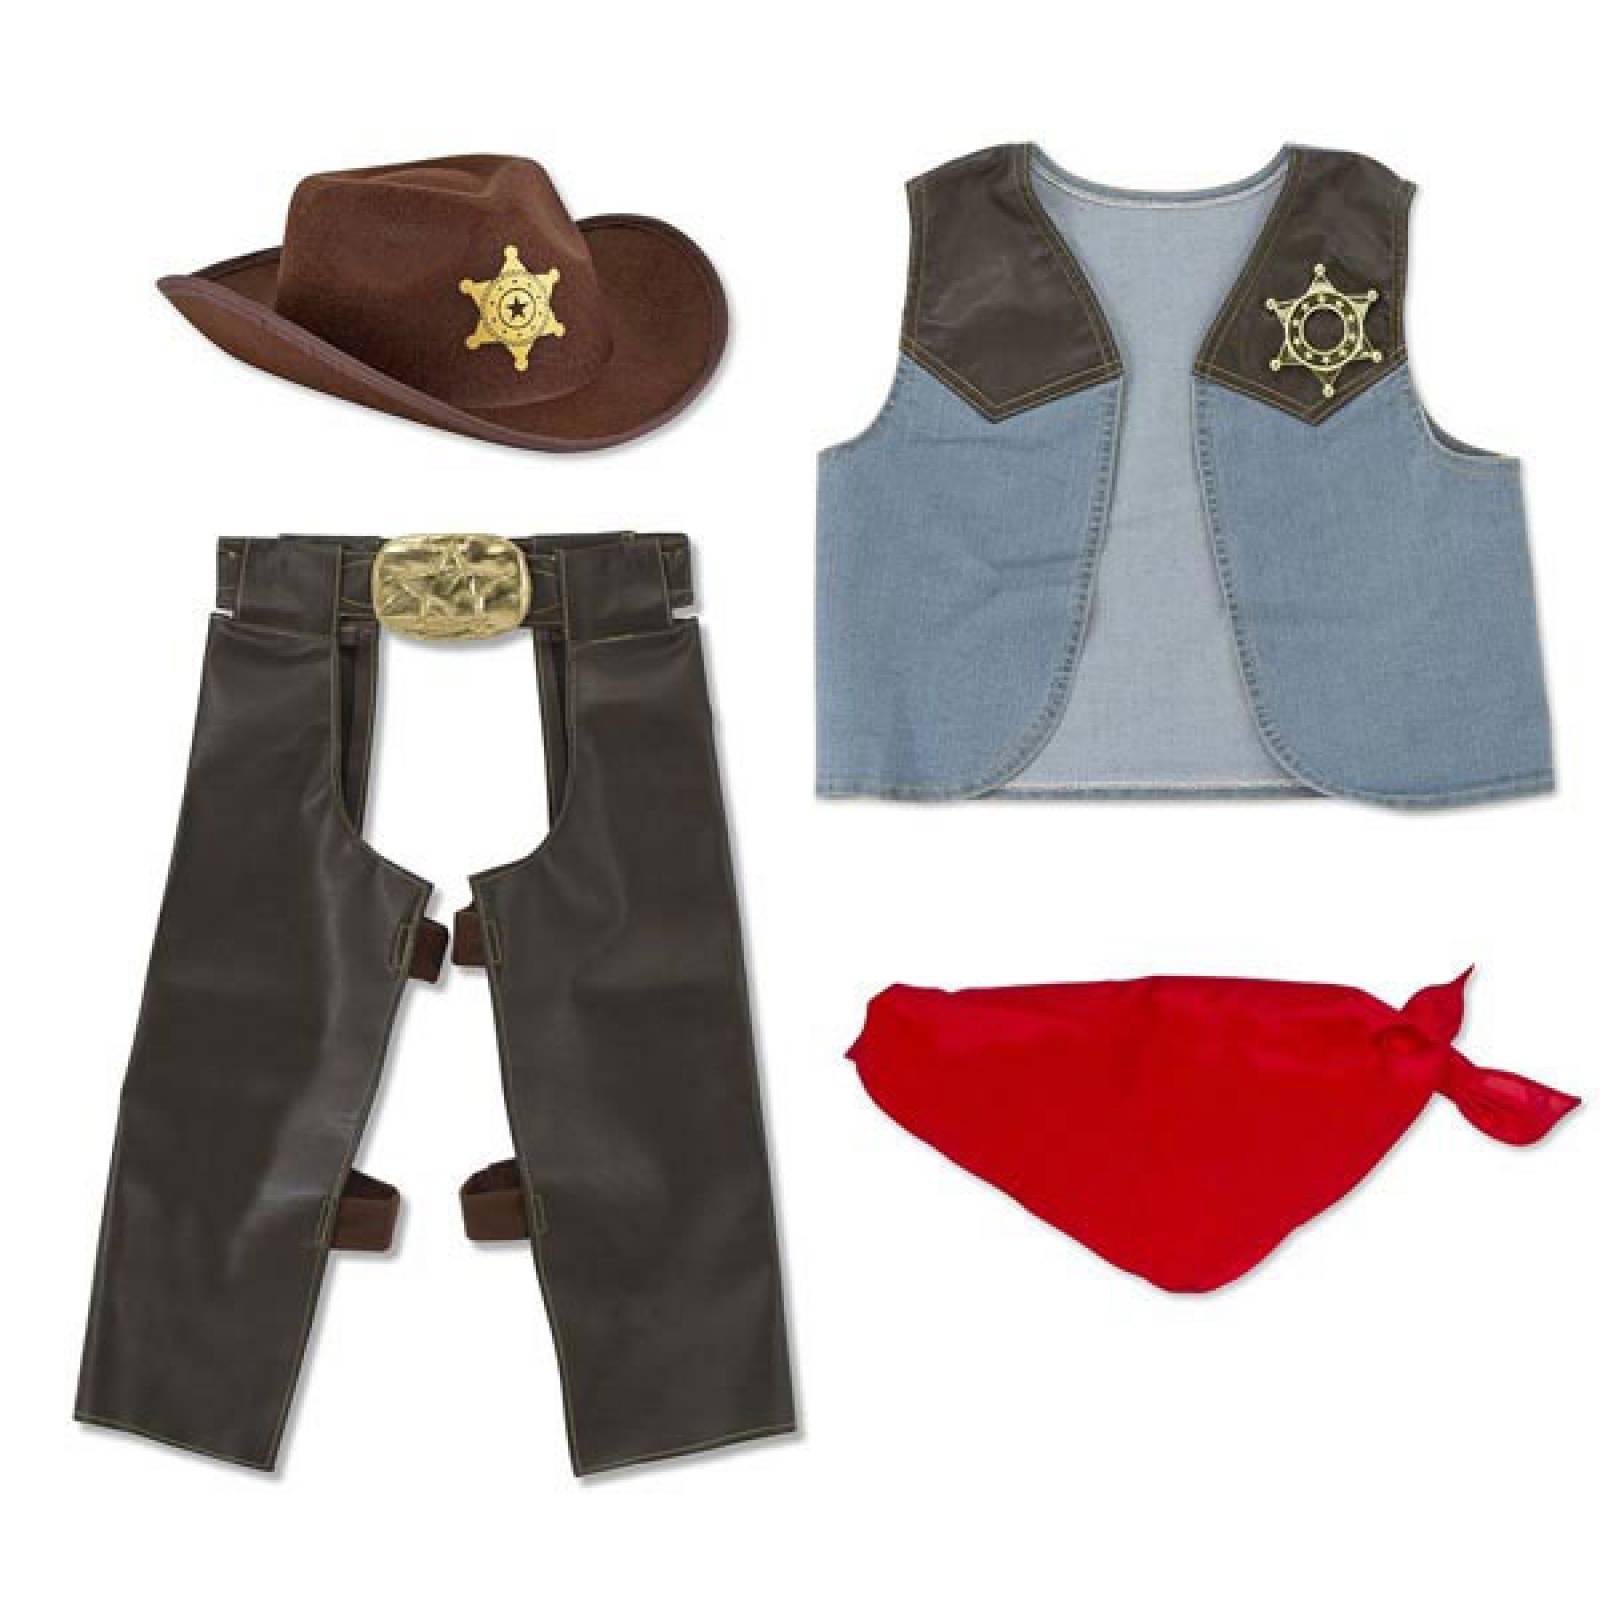 Fancy Dress Role Play Costume Set - Cowboy